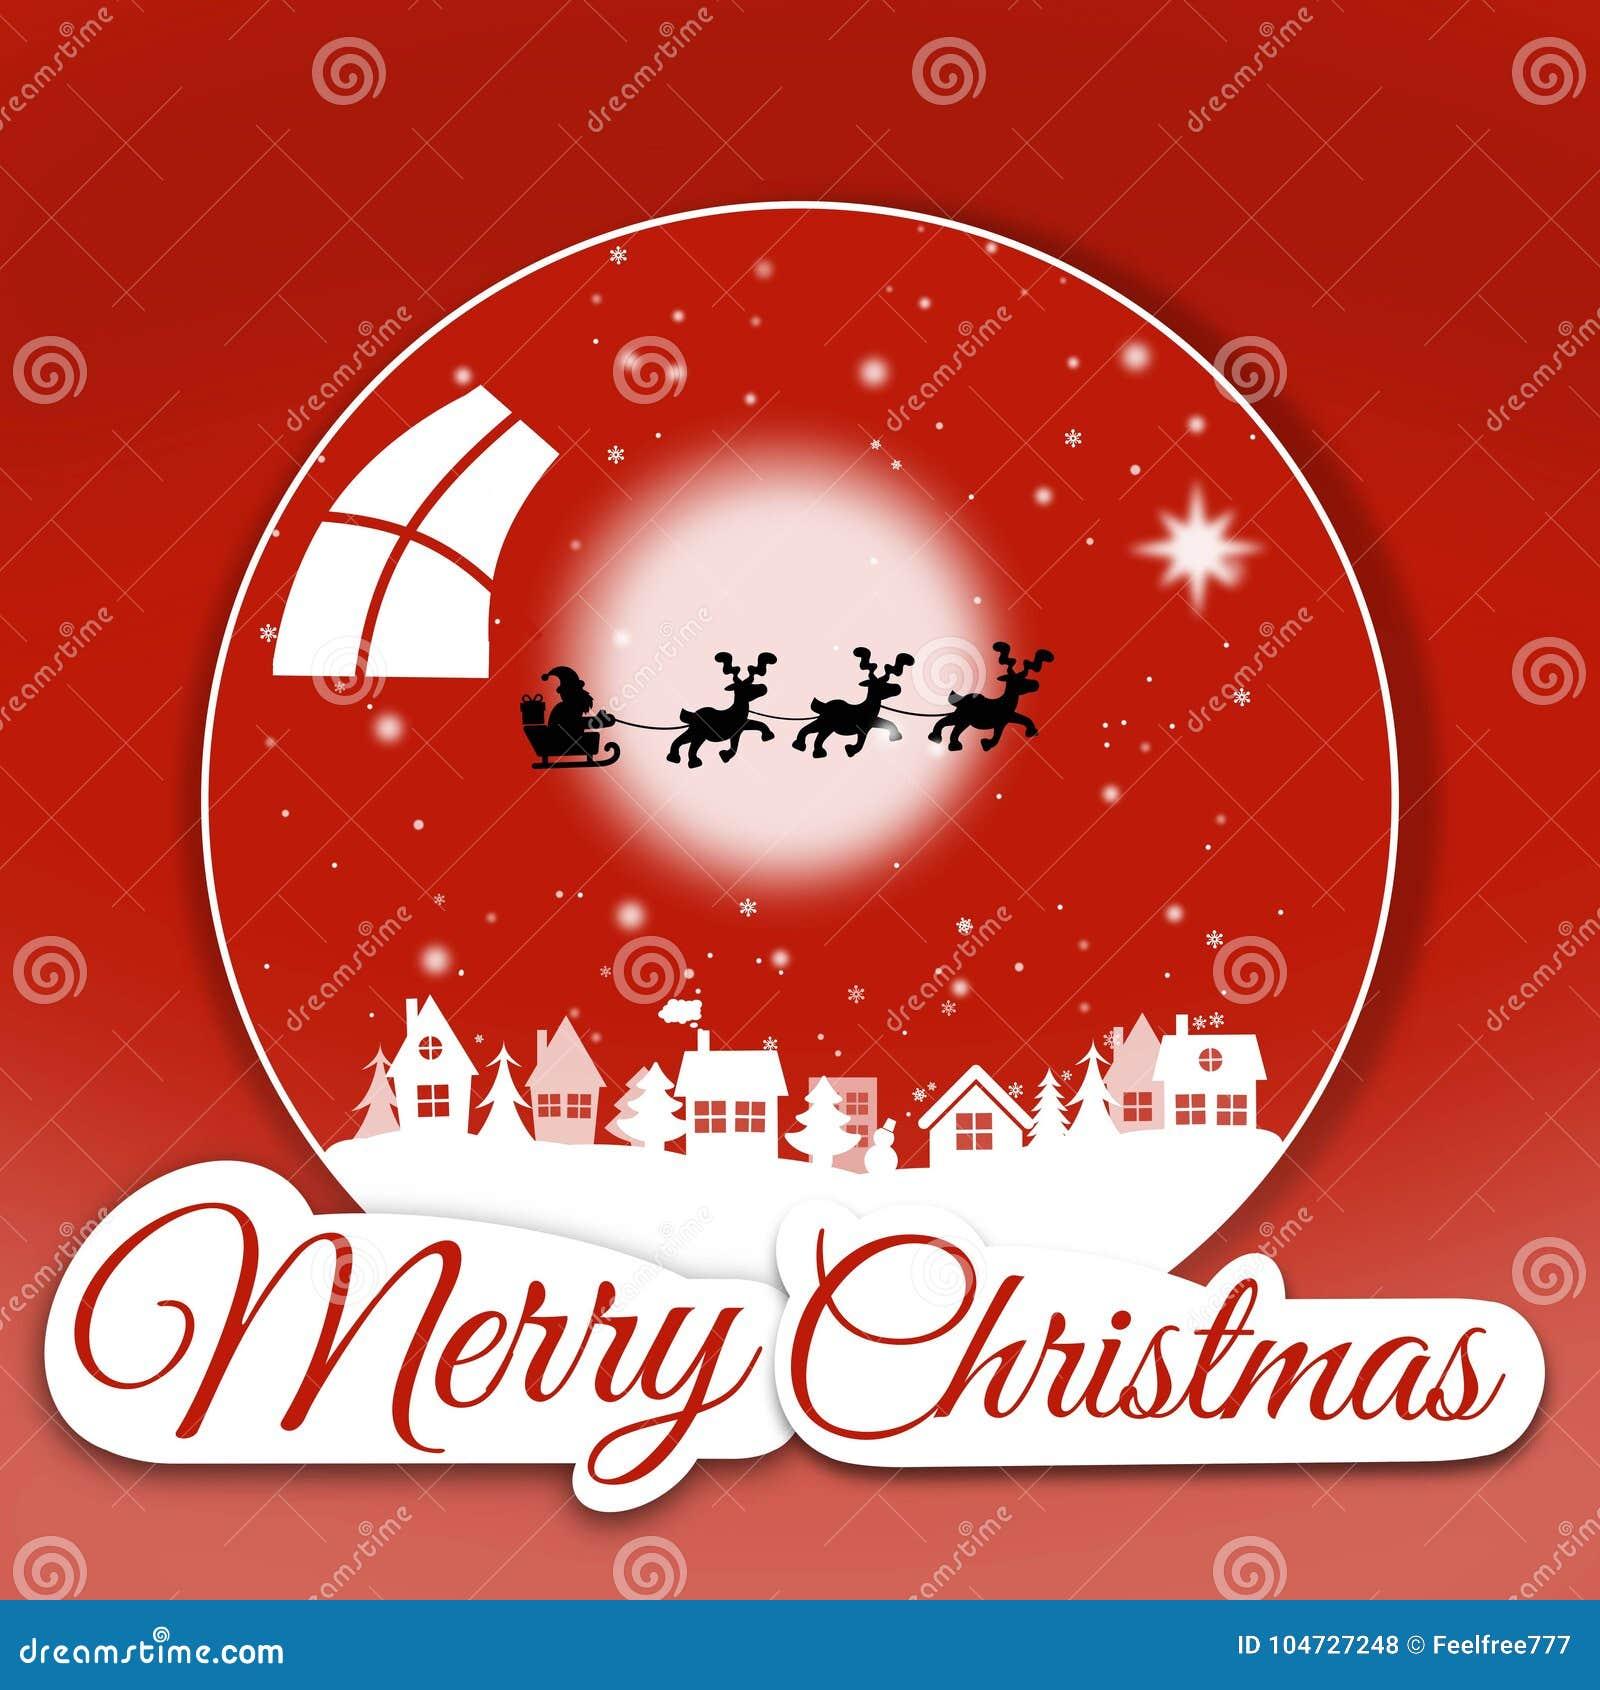 Merry christmas greeting card stock illustration illustration of download merry christmas greeting card stock illustration illustration of card conversation 104727248 m4hsunfo